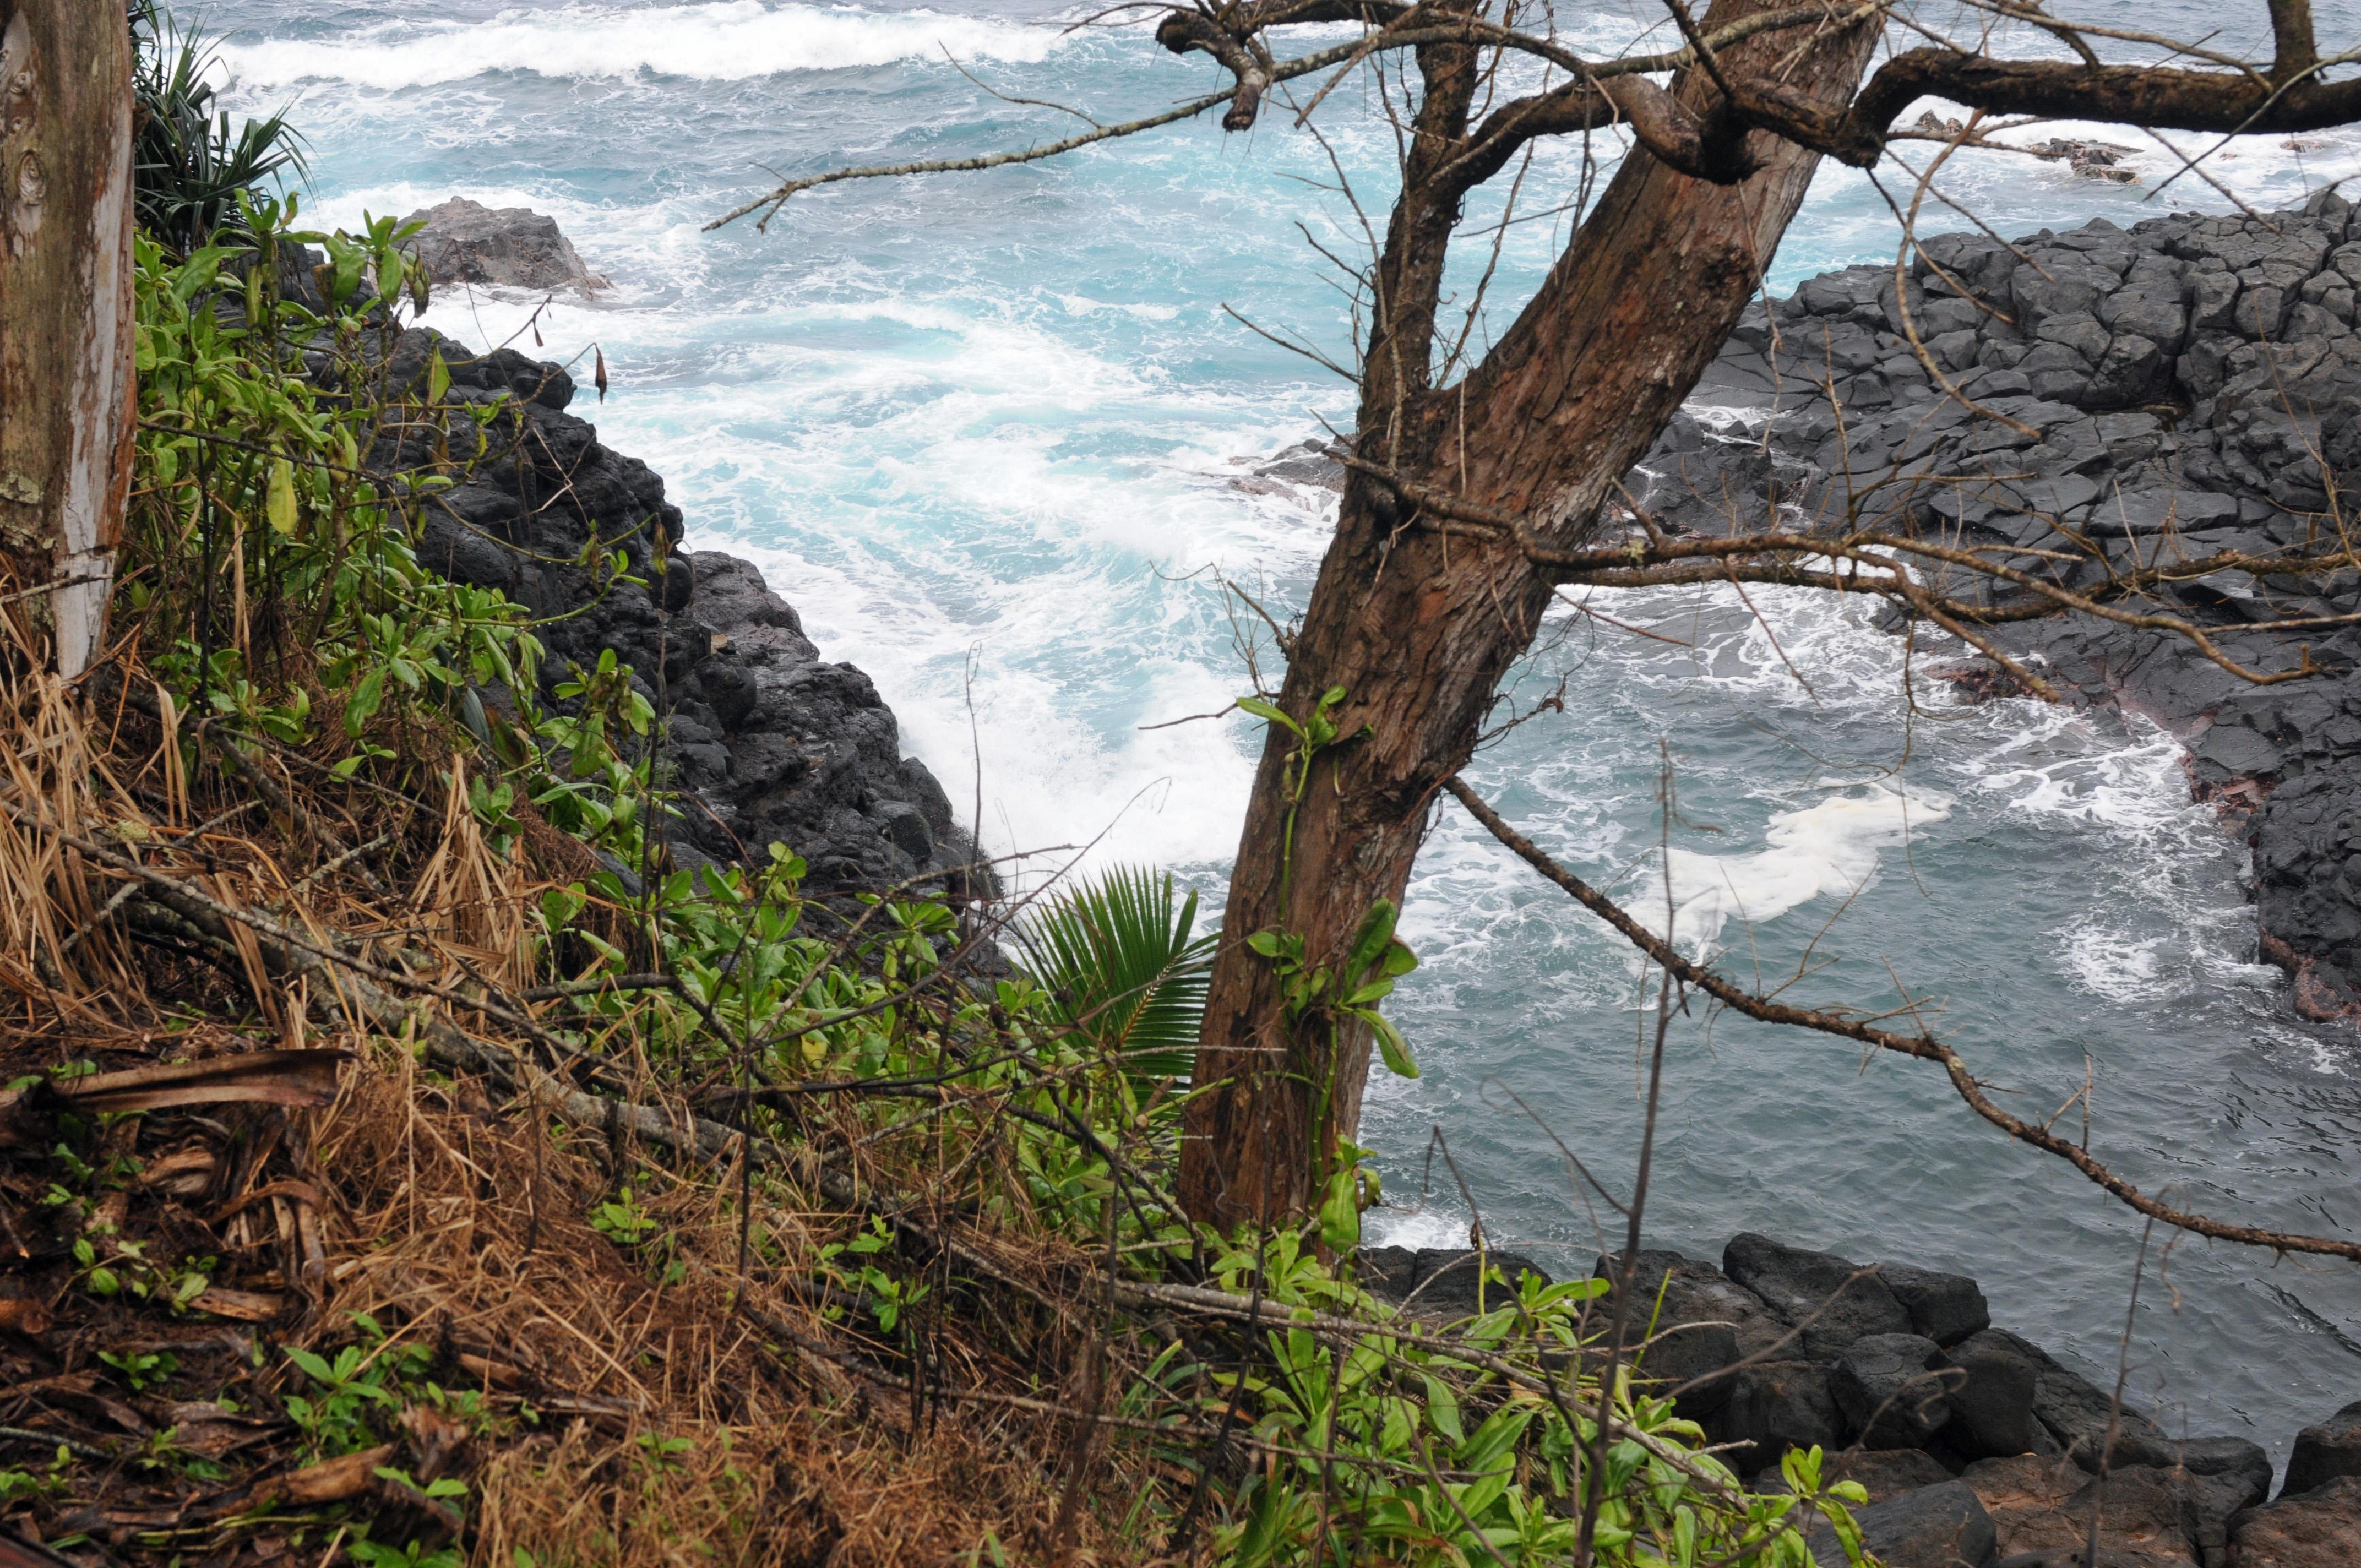 Kauai: Tourists Keep Coming To Queen's Bath Despite The